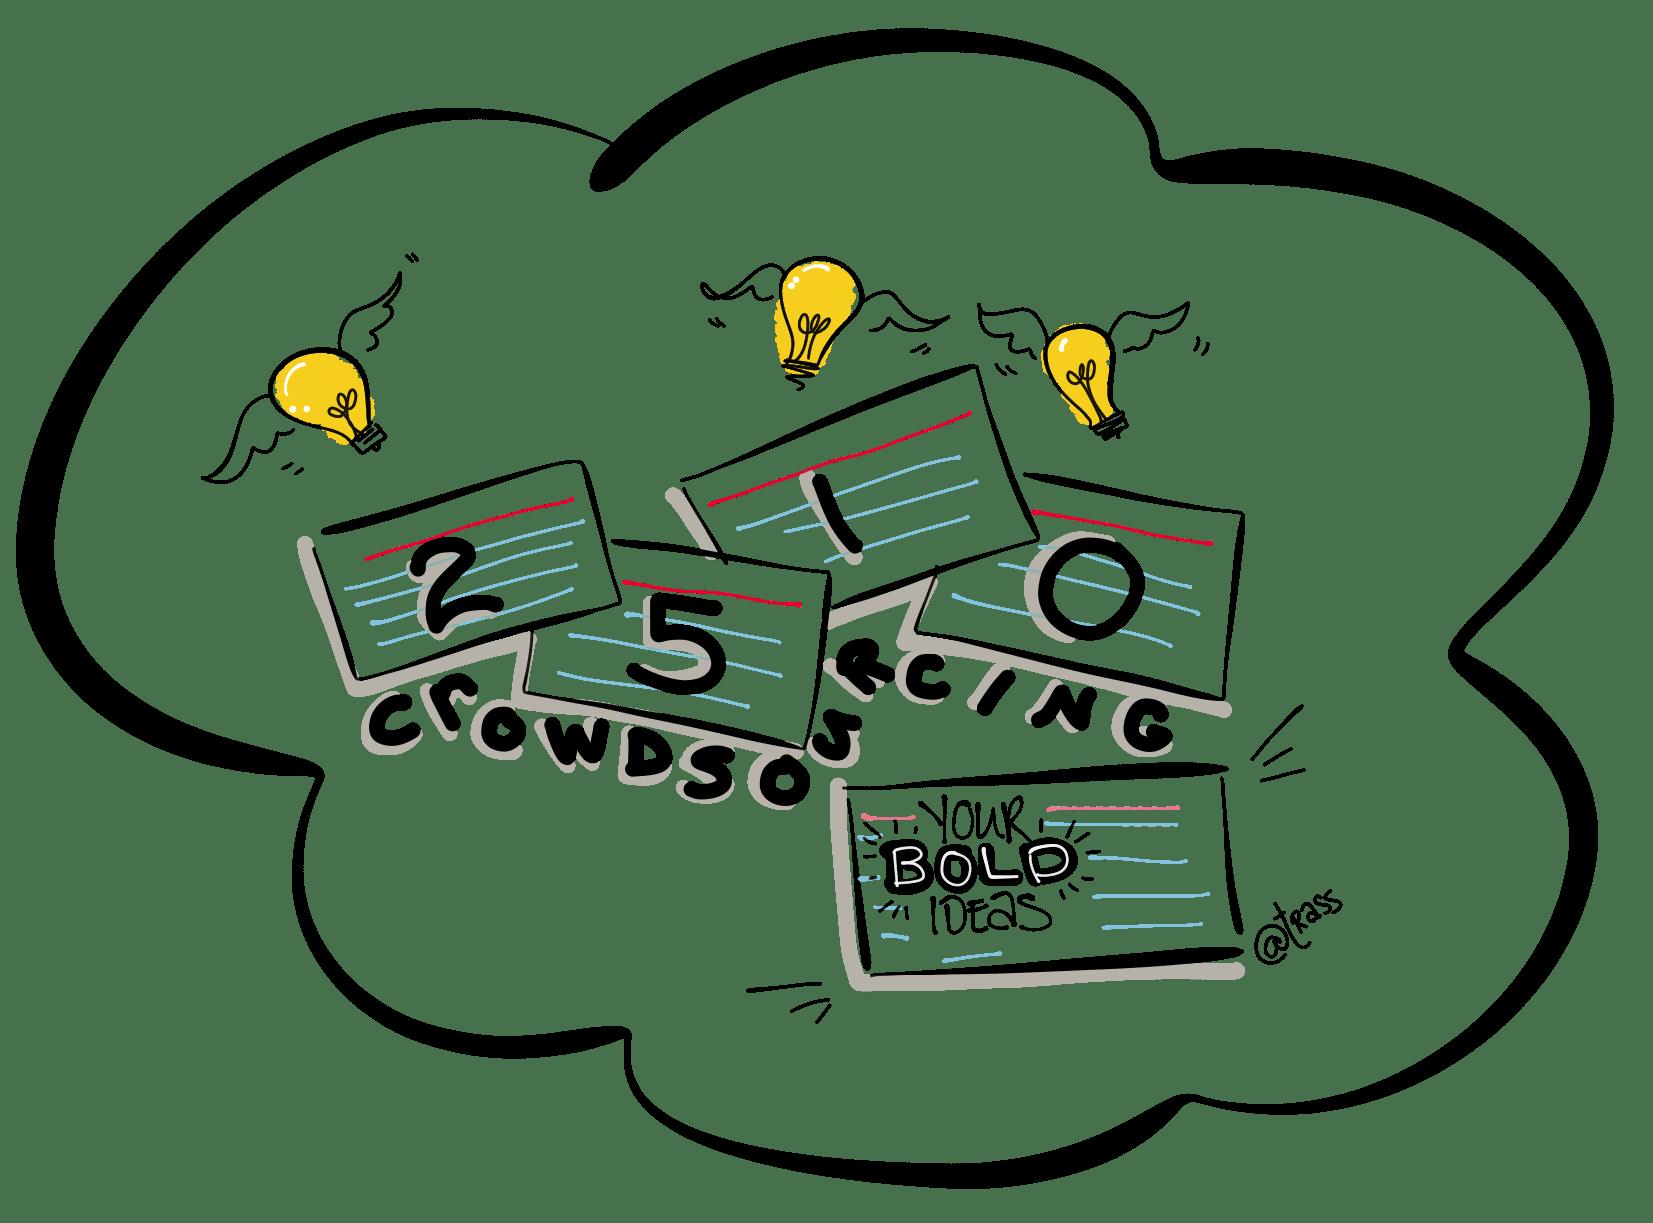 Curriculum clipart classroom environment, Curriculum